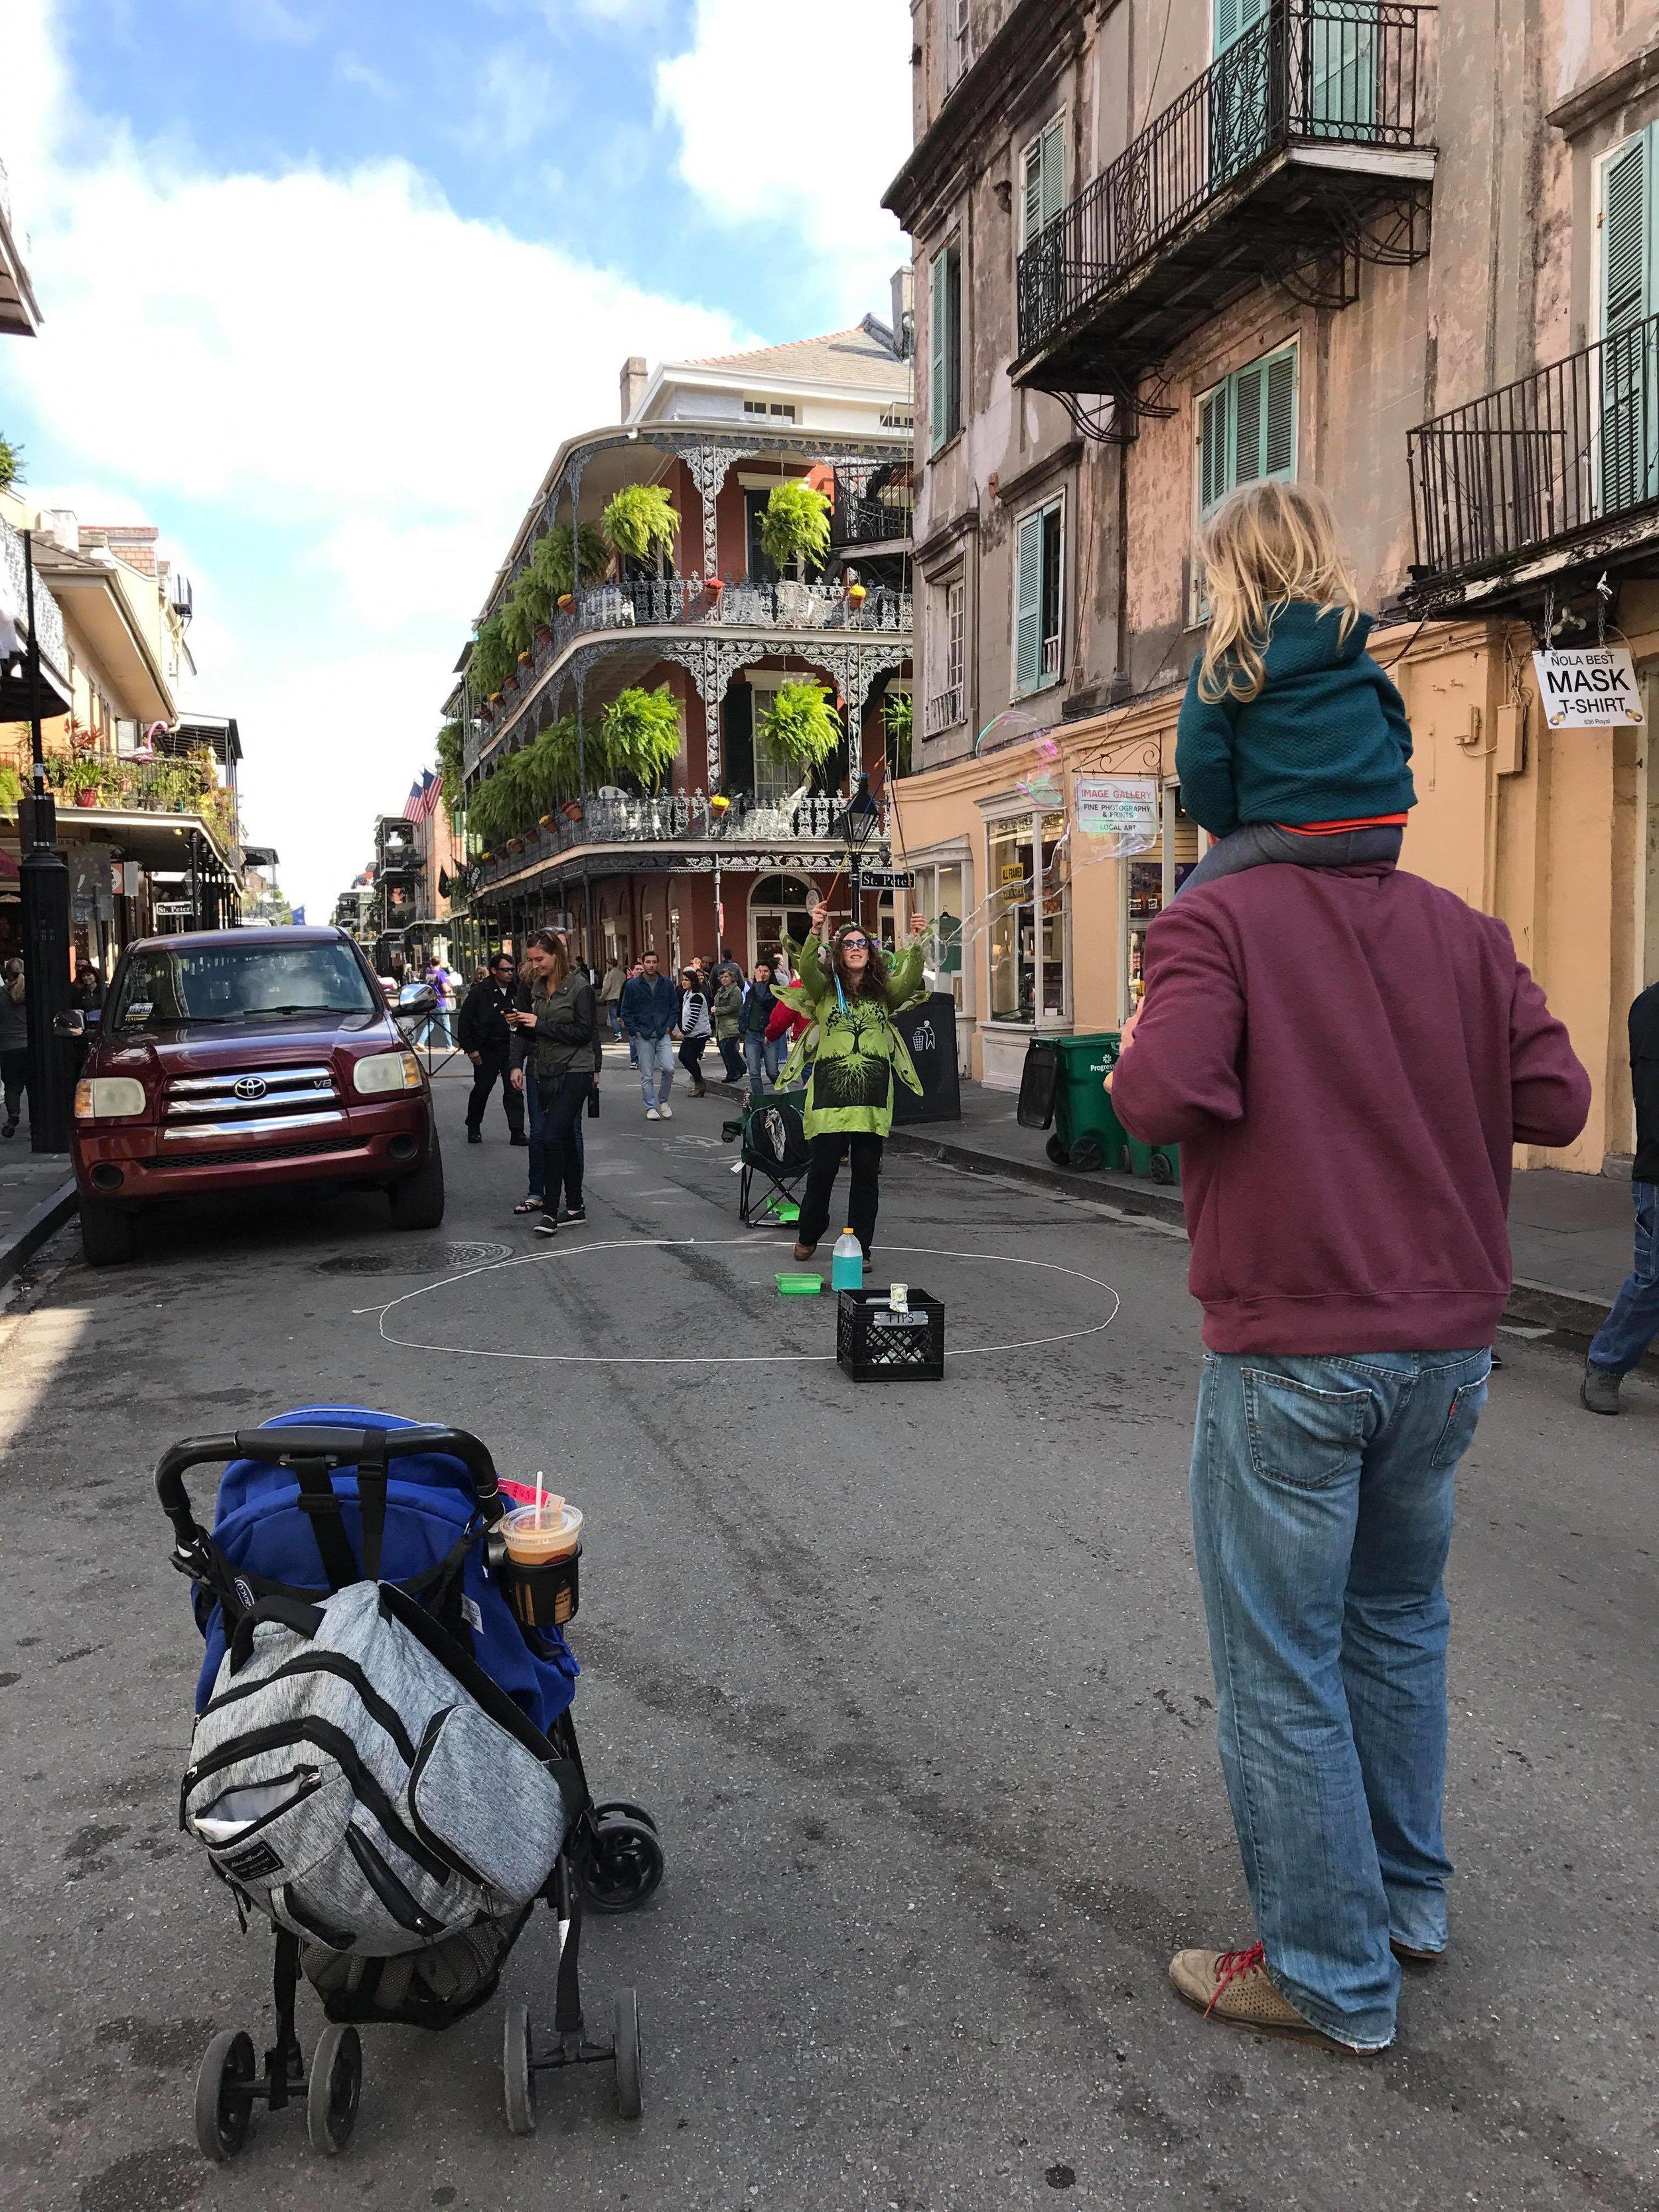 Enjoying the bubble street performer